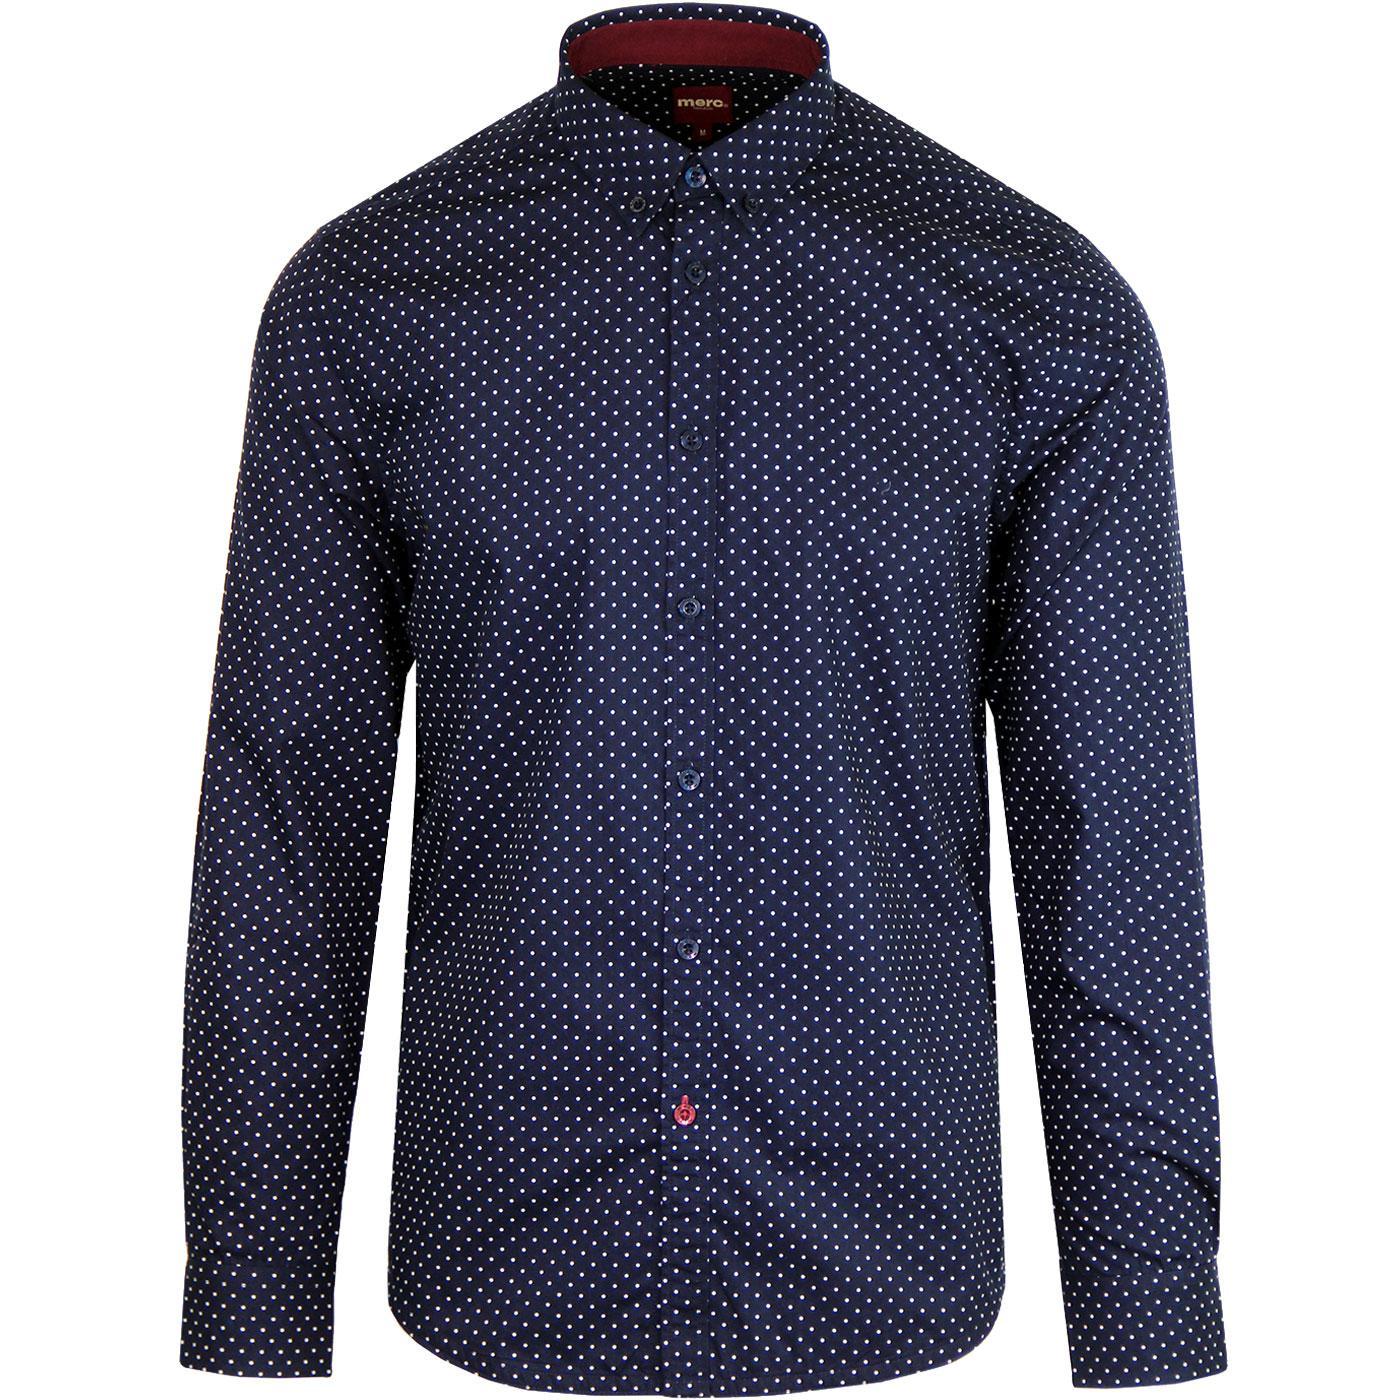 Siegel MERC Retro Sixties Polka Dot Mod Shirt (N)